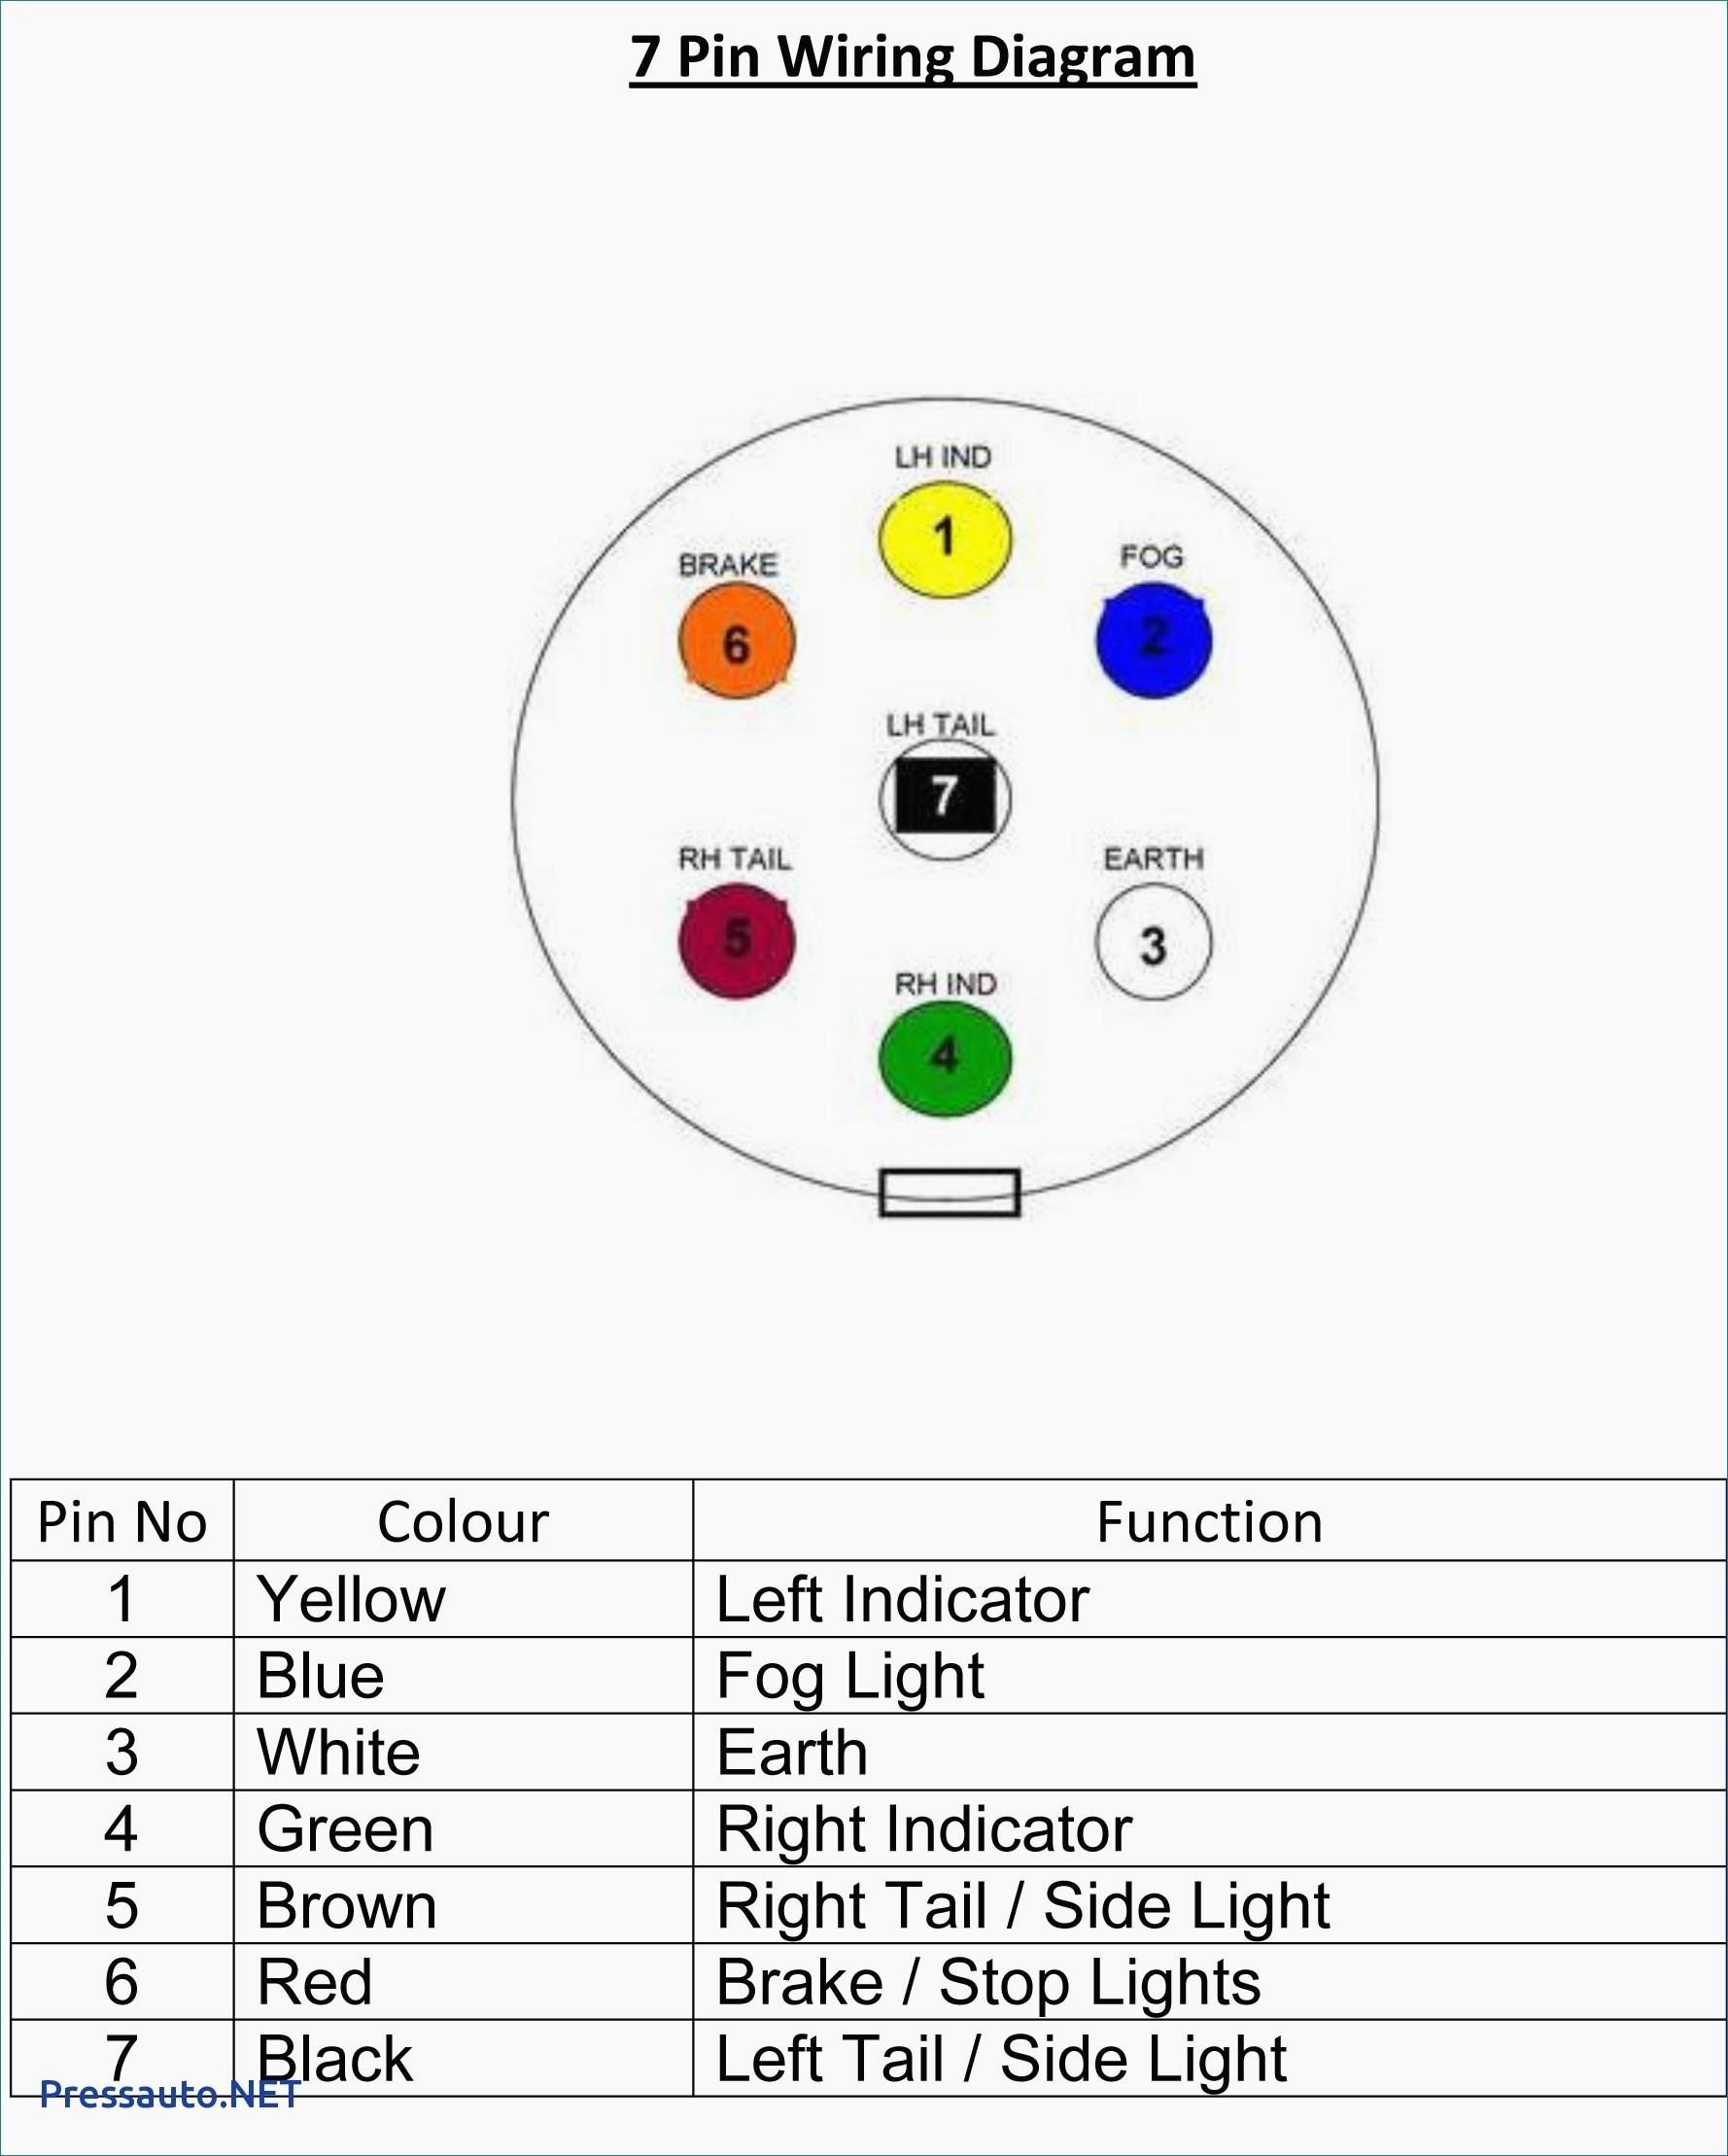 Ford Rv Plug Wiring Diagram | Wiring Diagram - Seven Pin Wiring Diagram